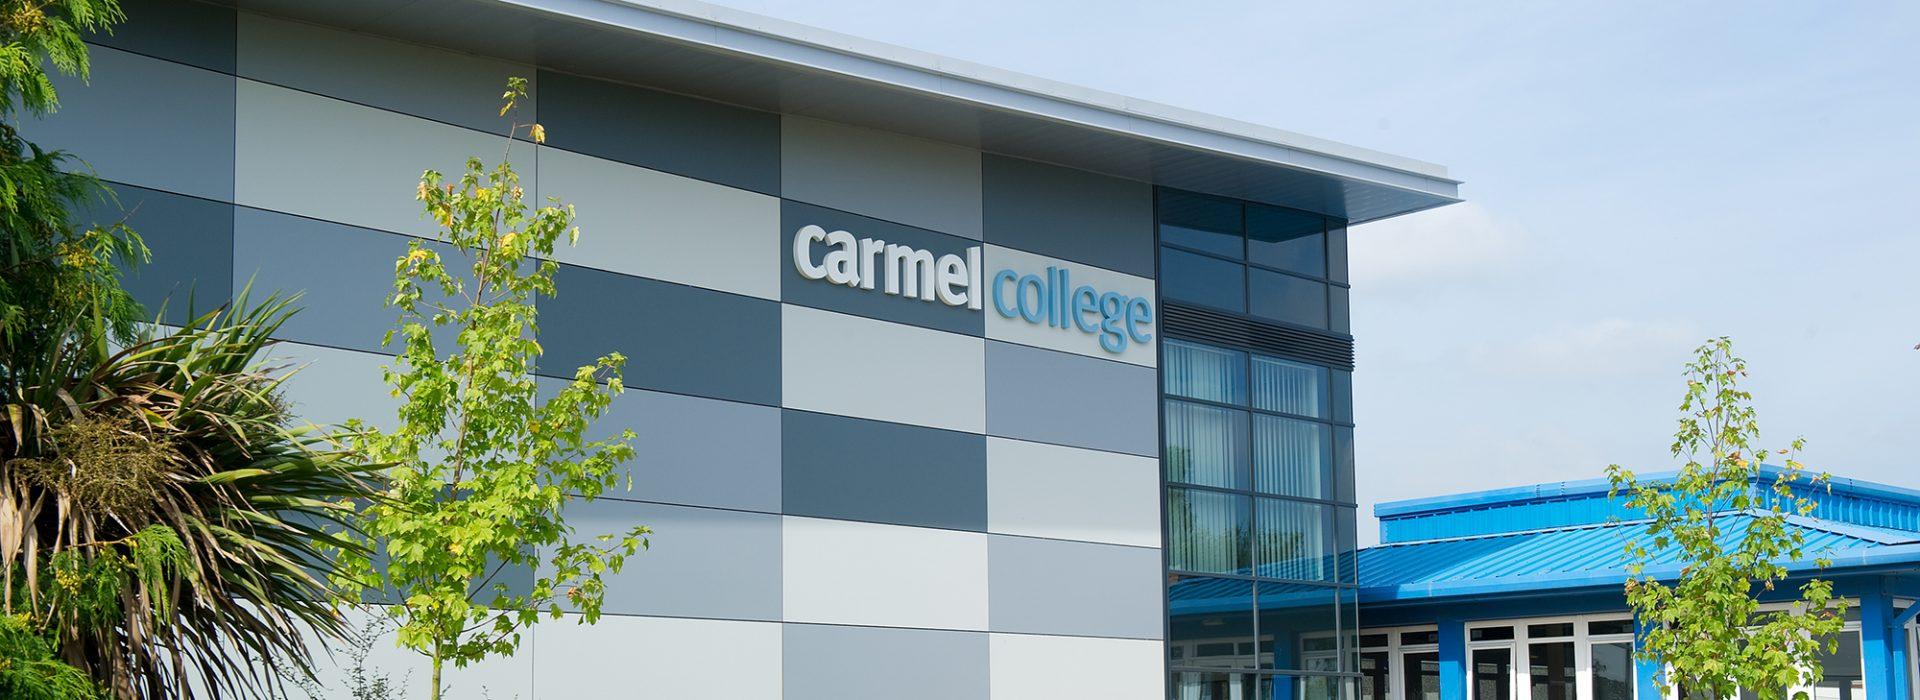 Front of Carmel College building entrance